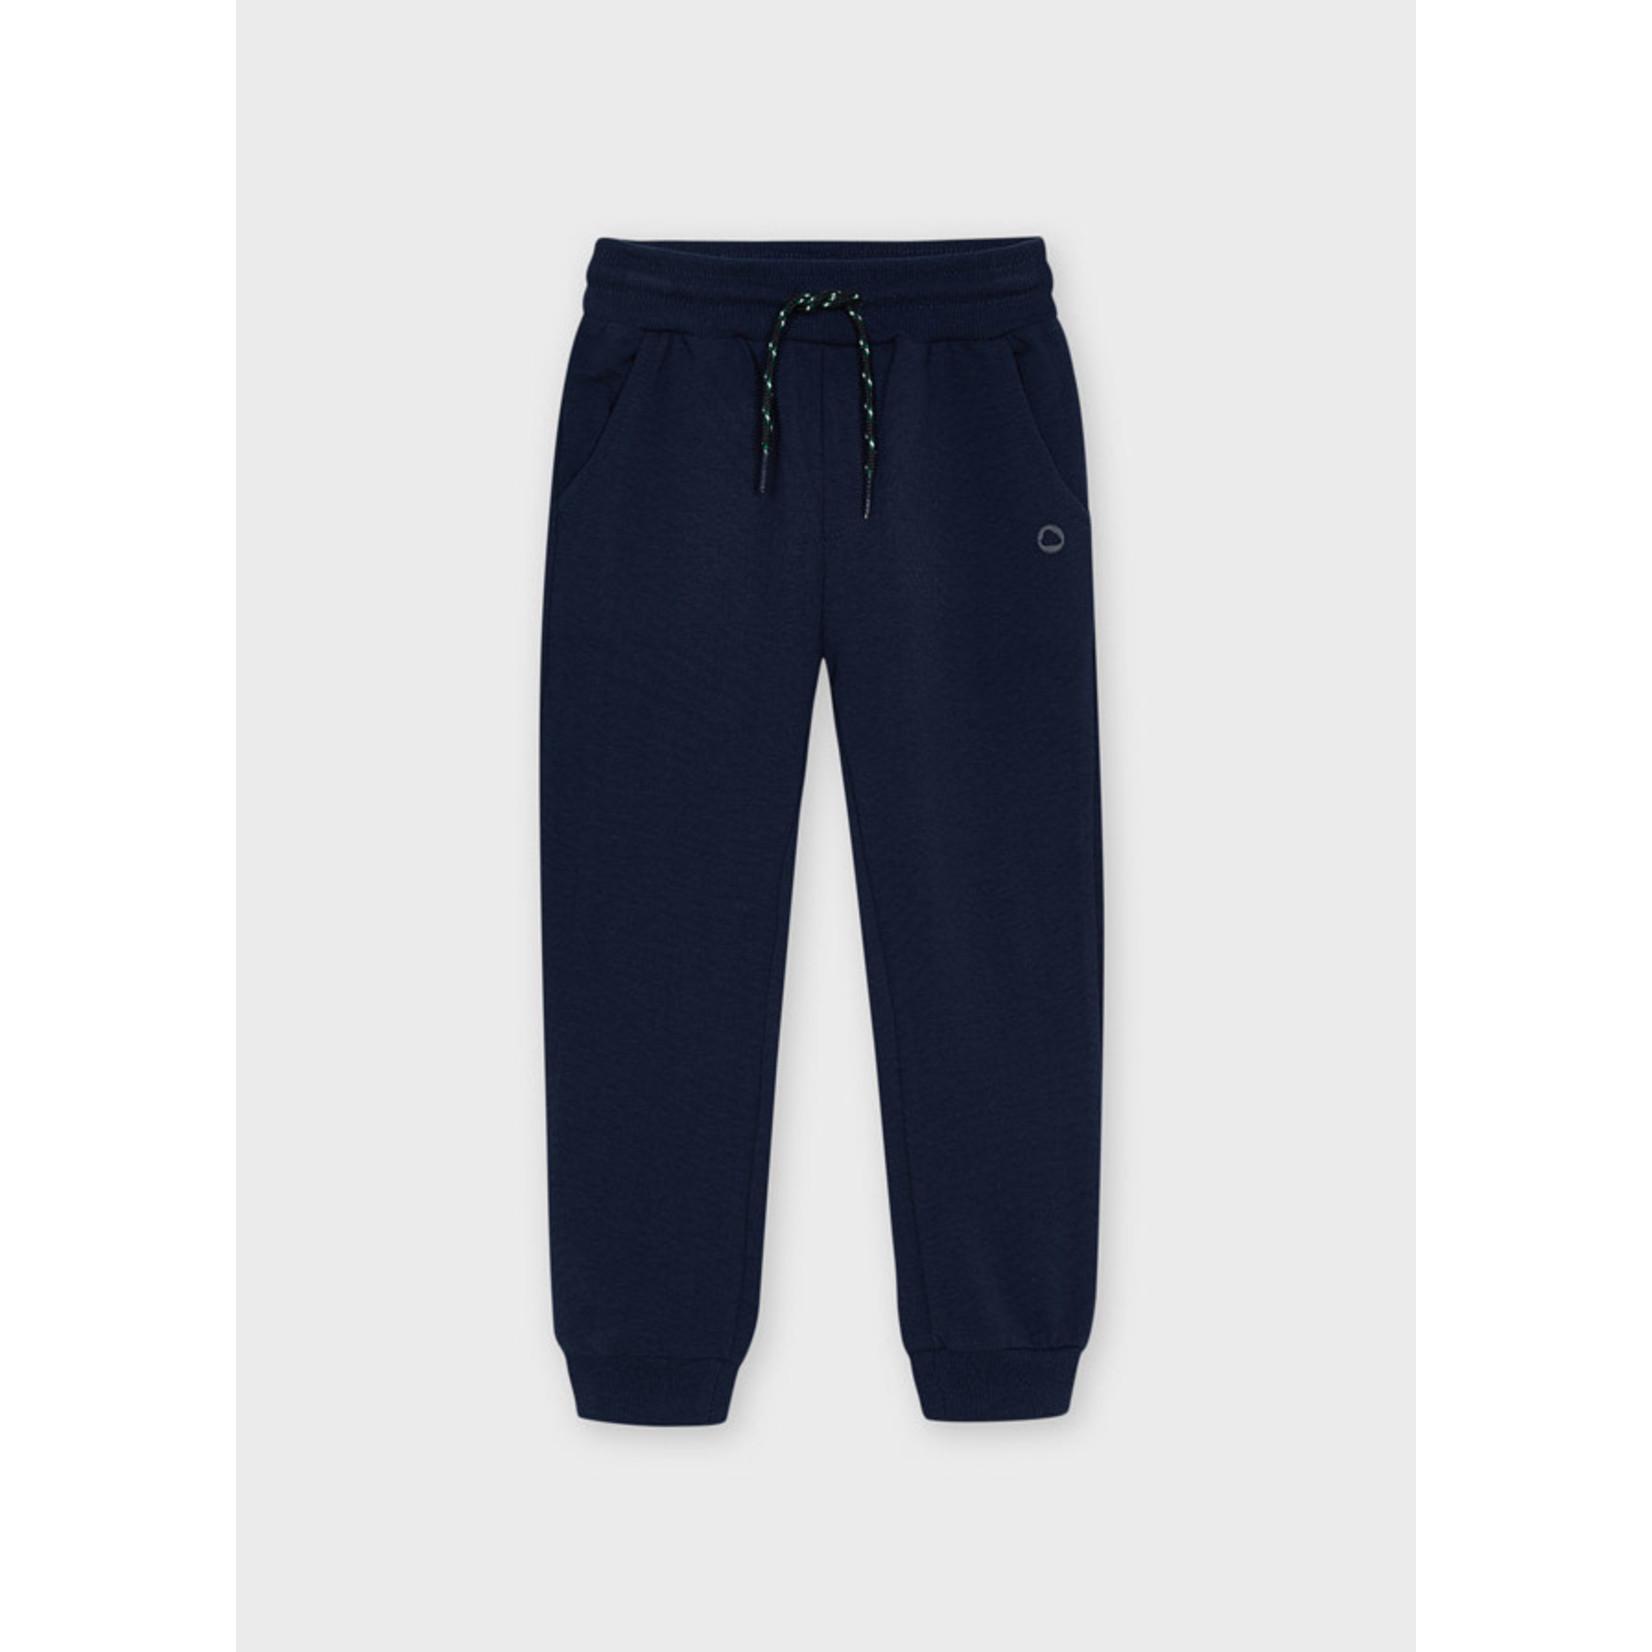 Mayoral Basic Cuffed Fleece Trousers, Navy